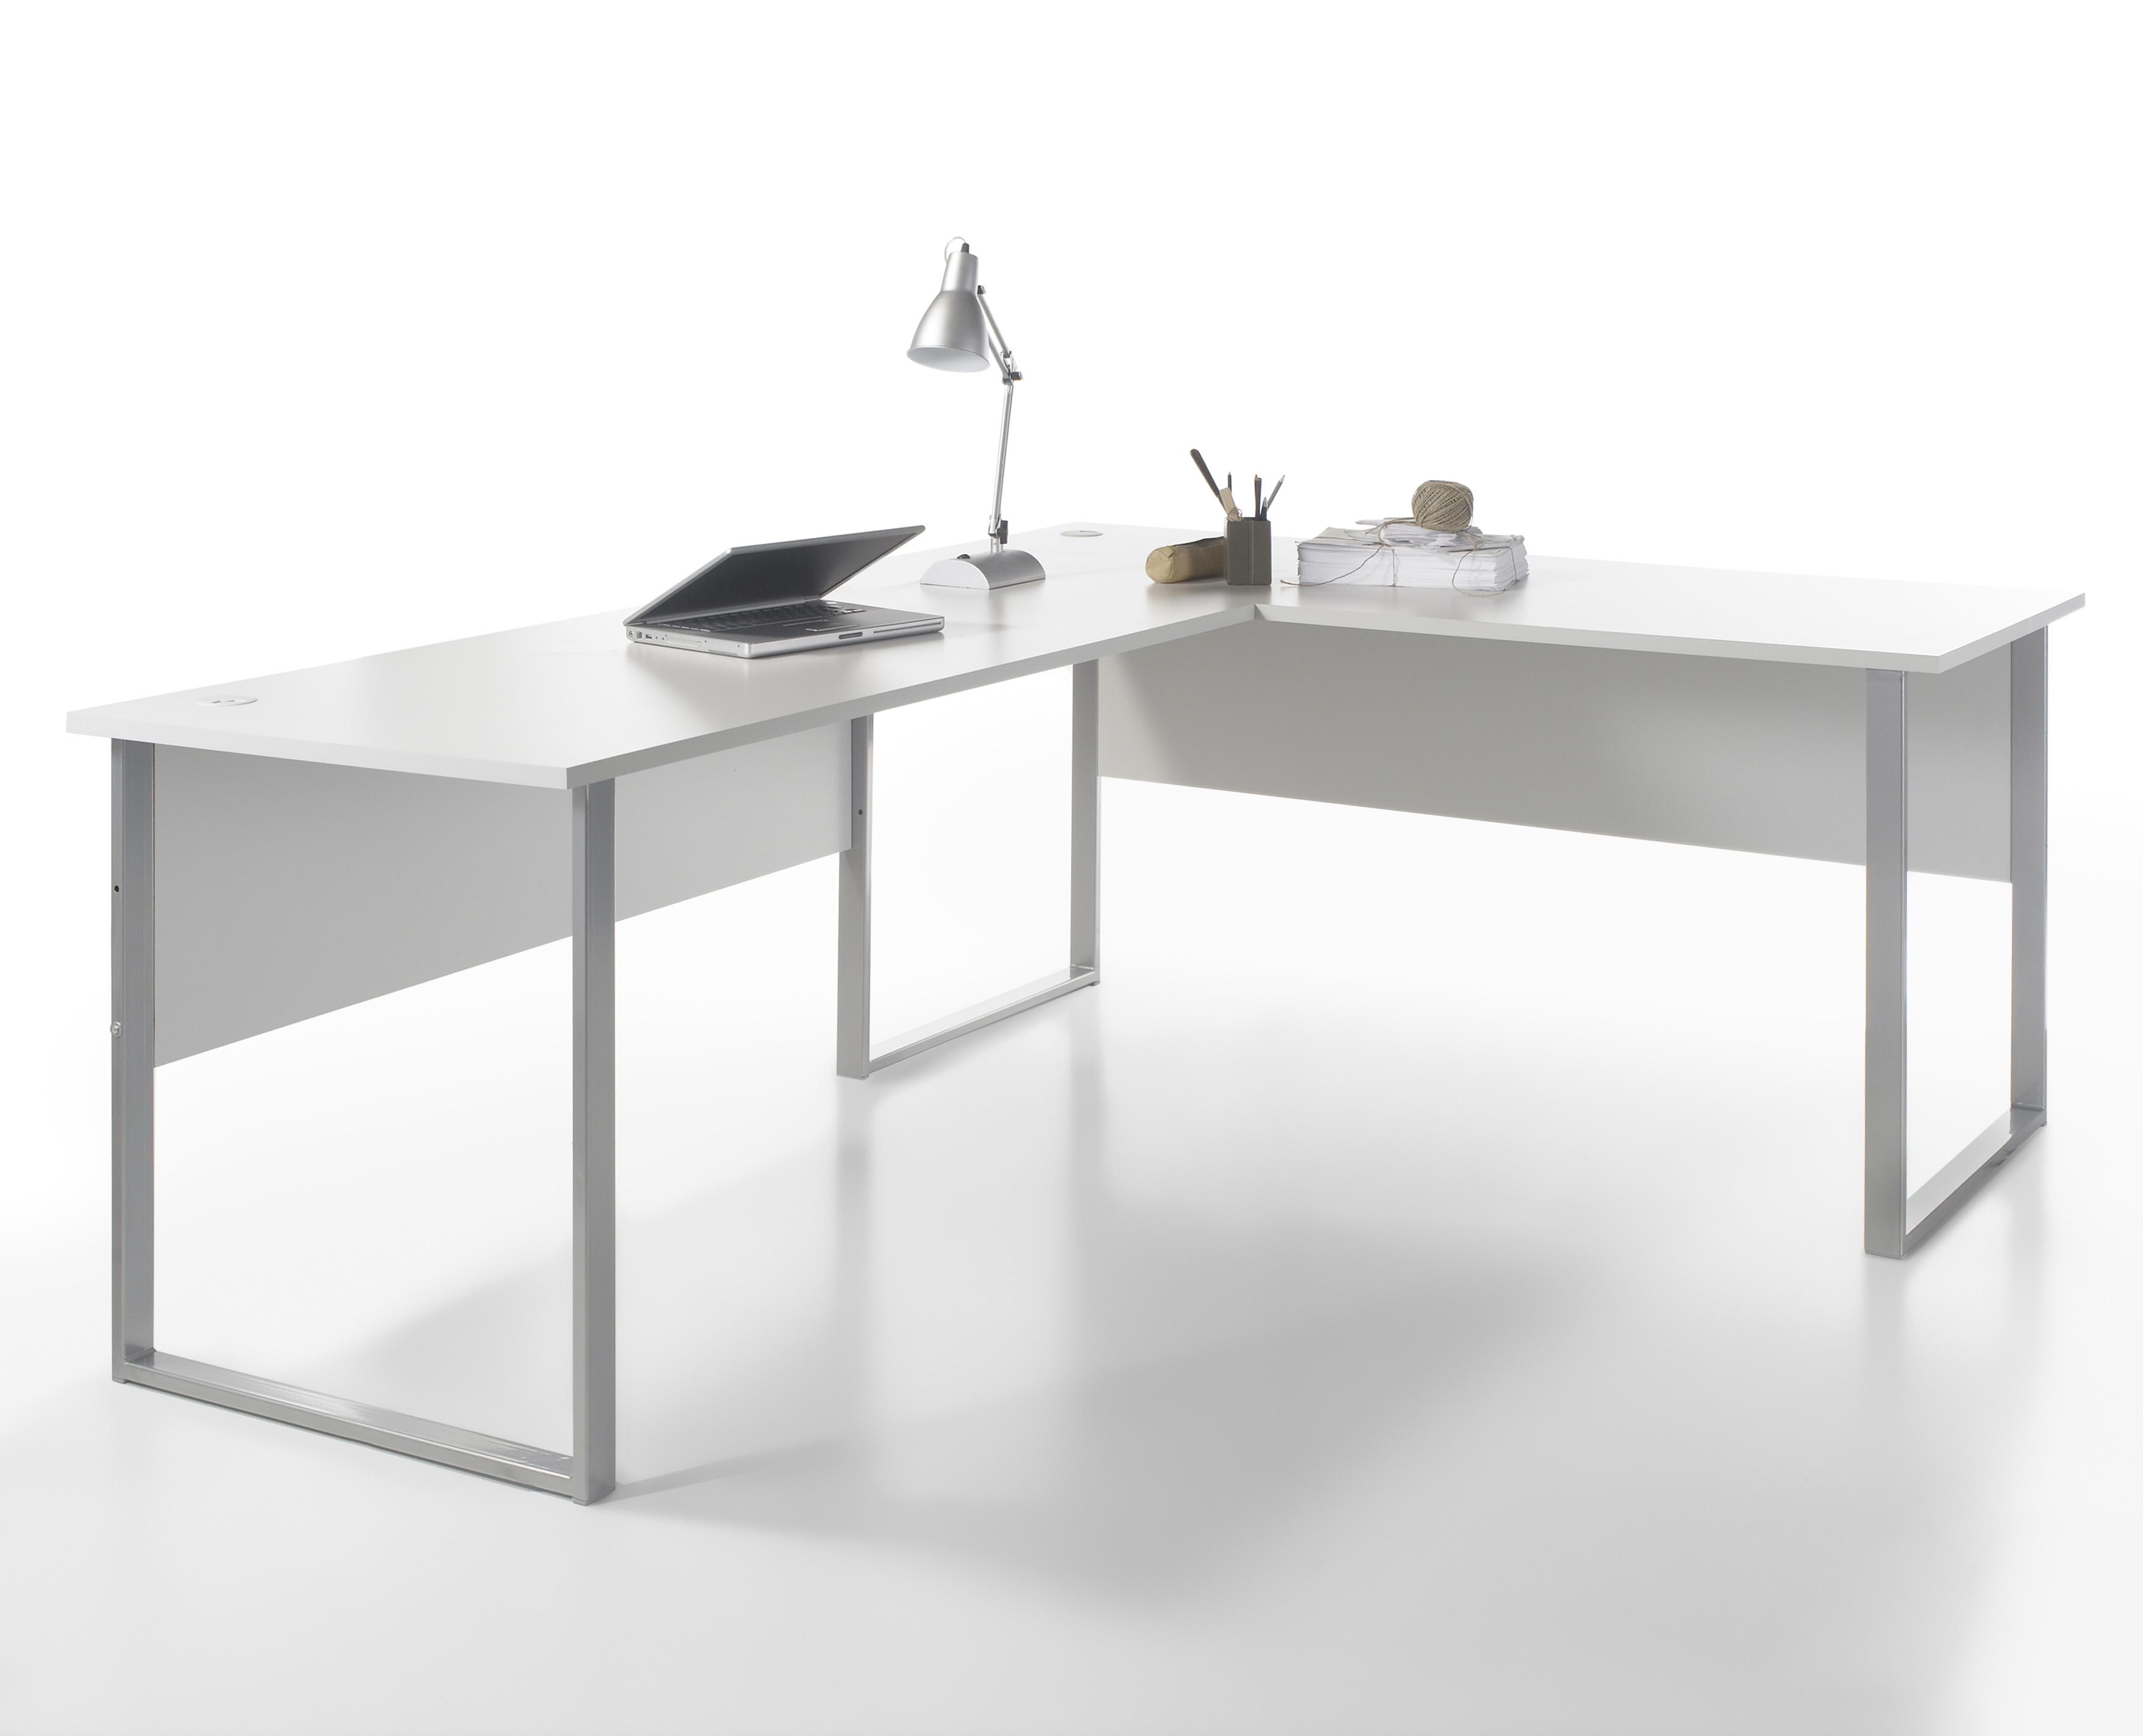 Büromöbel weiß grau  Büromöbel-Set OFFICE LINE LUX Schreibtisch Regalwand Büroeinrichtung ...